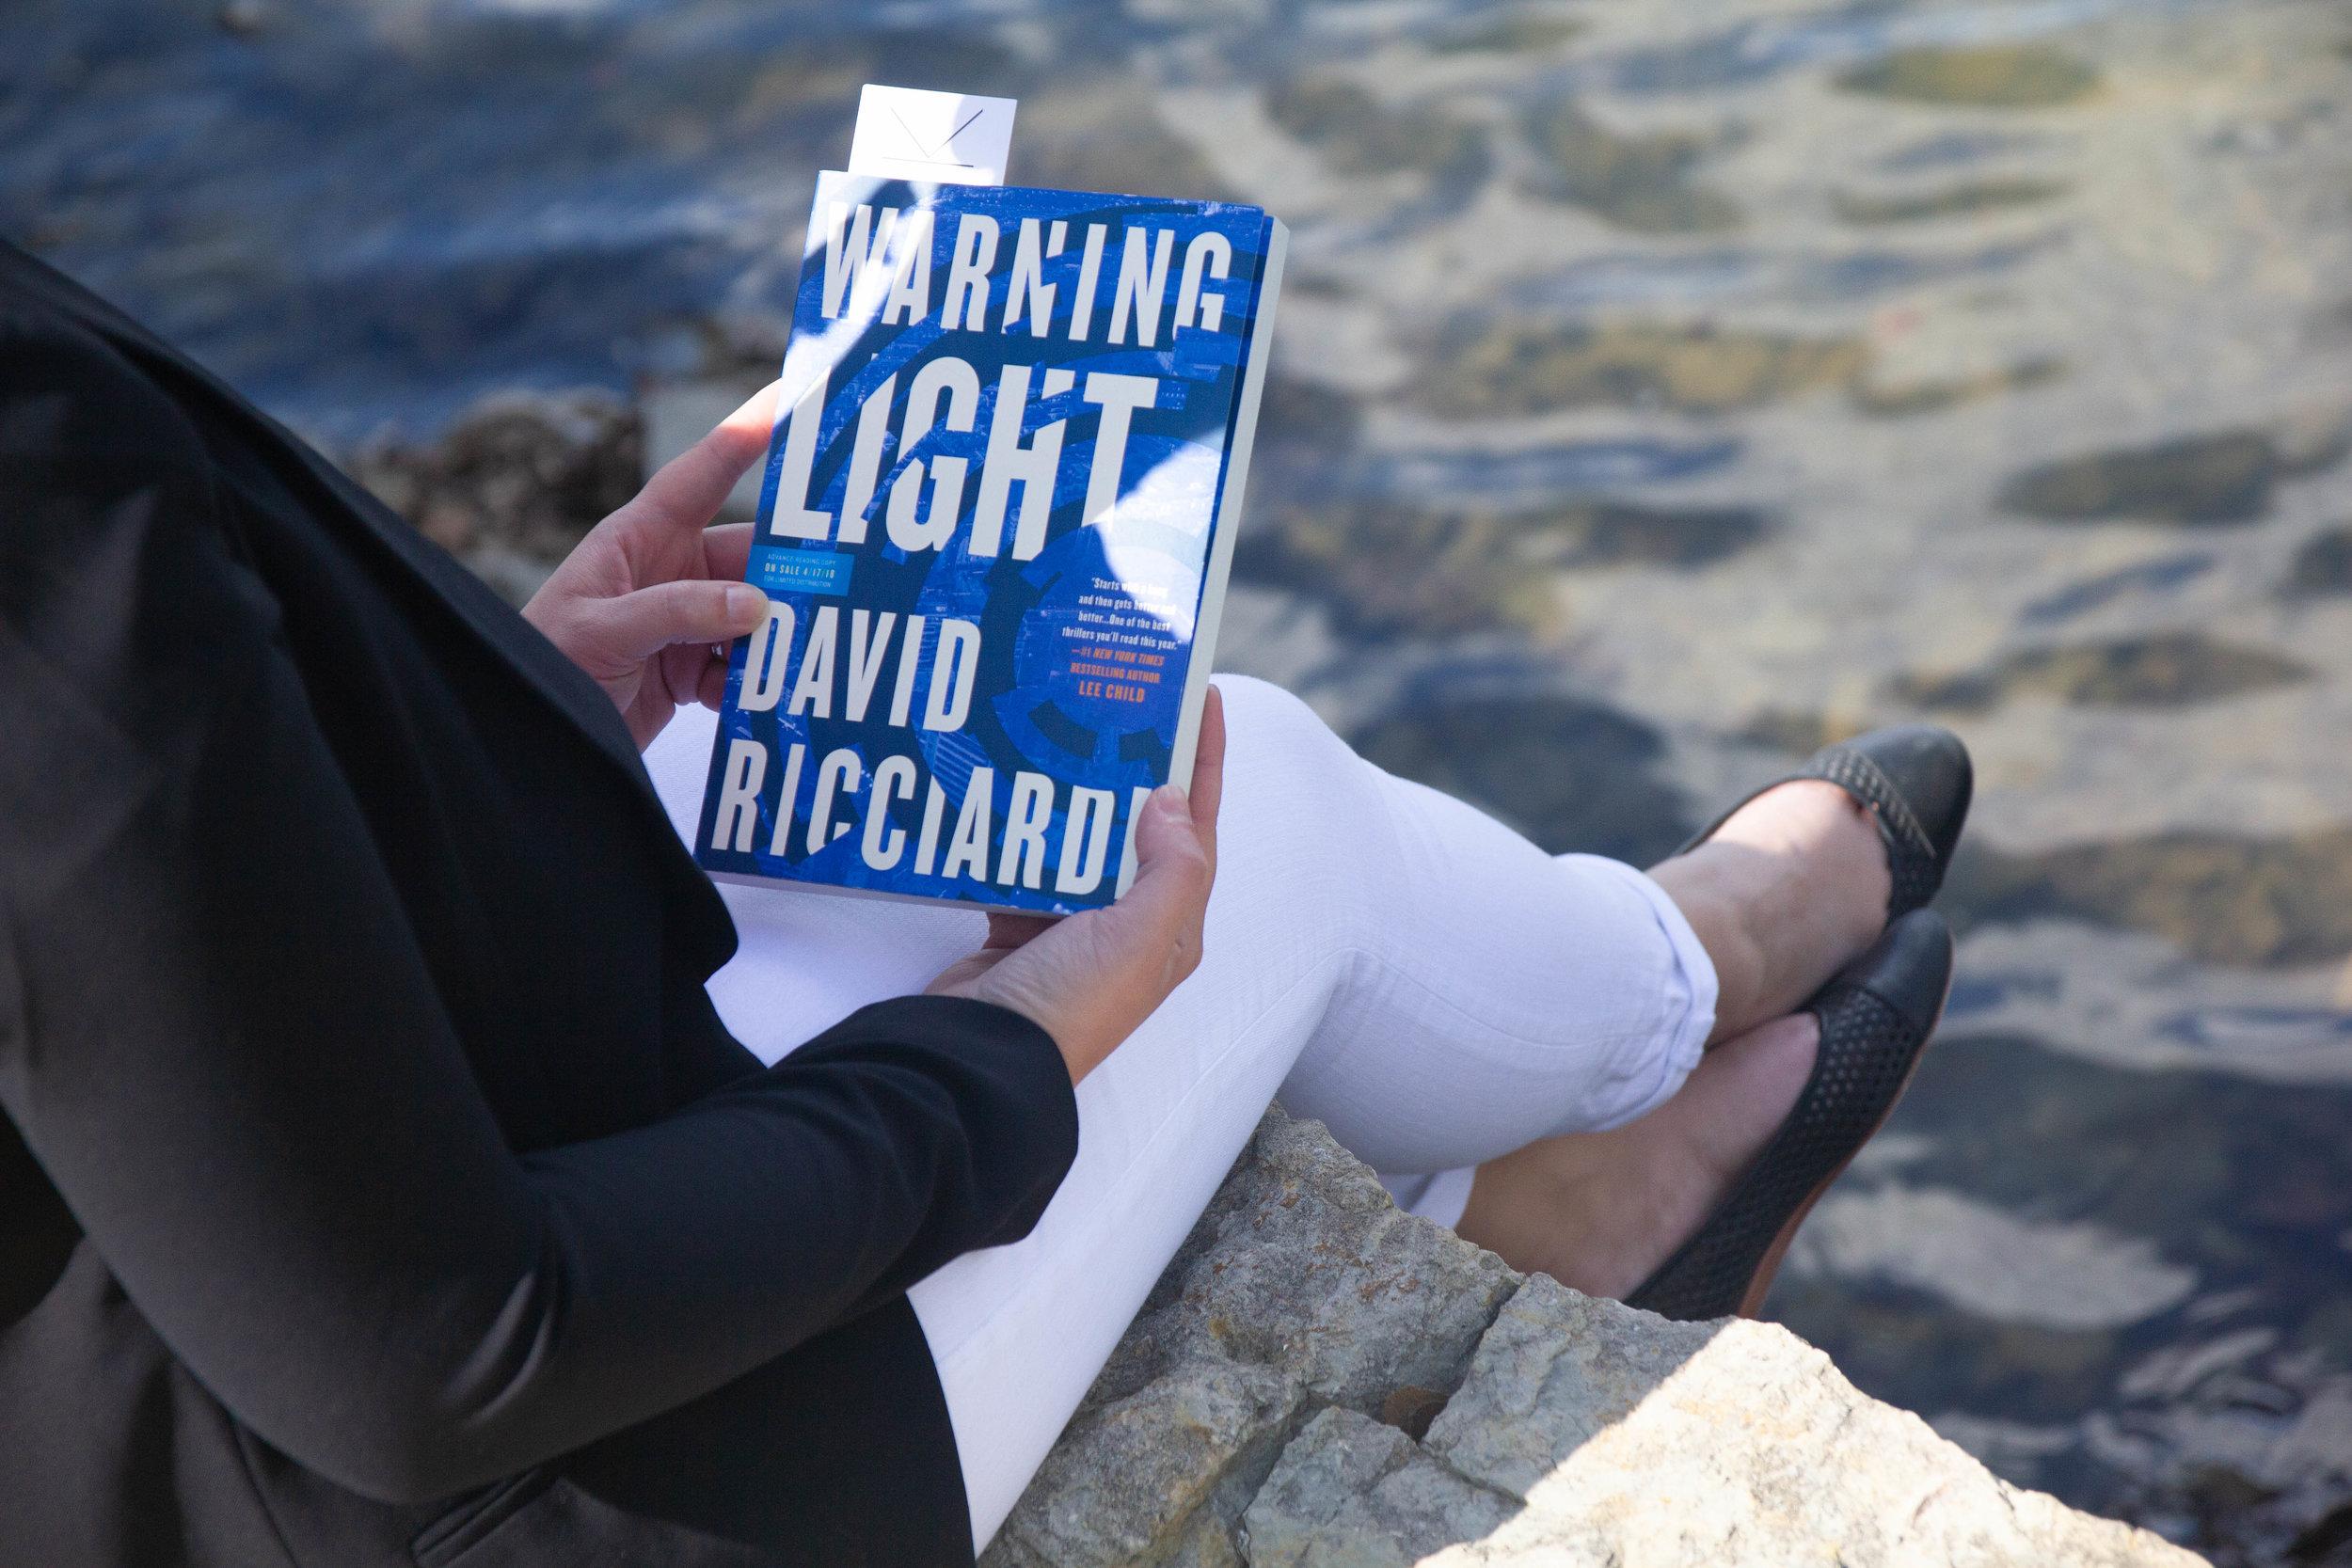 Reading Warning Light by David Ricciardi in New Town at St. Charles, MO